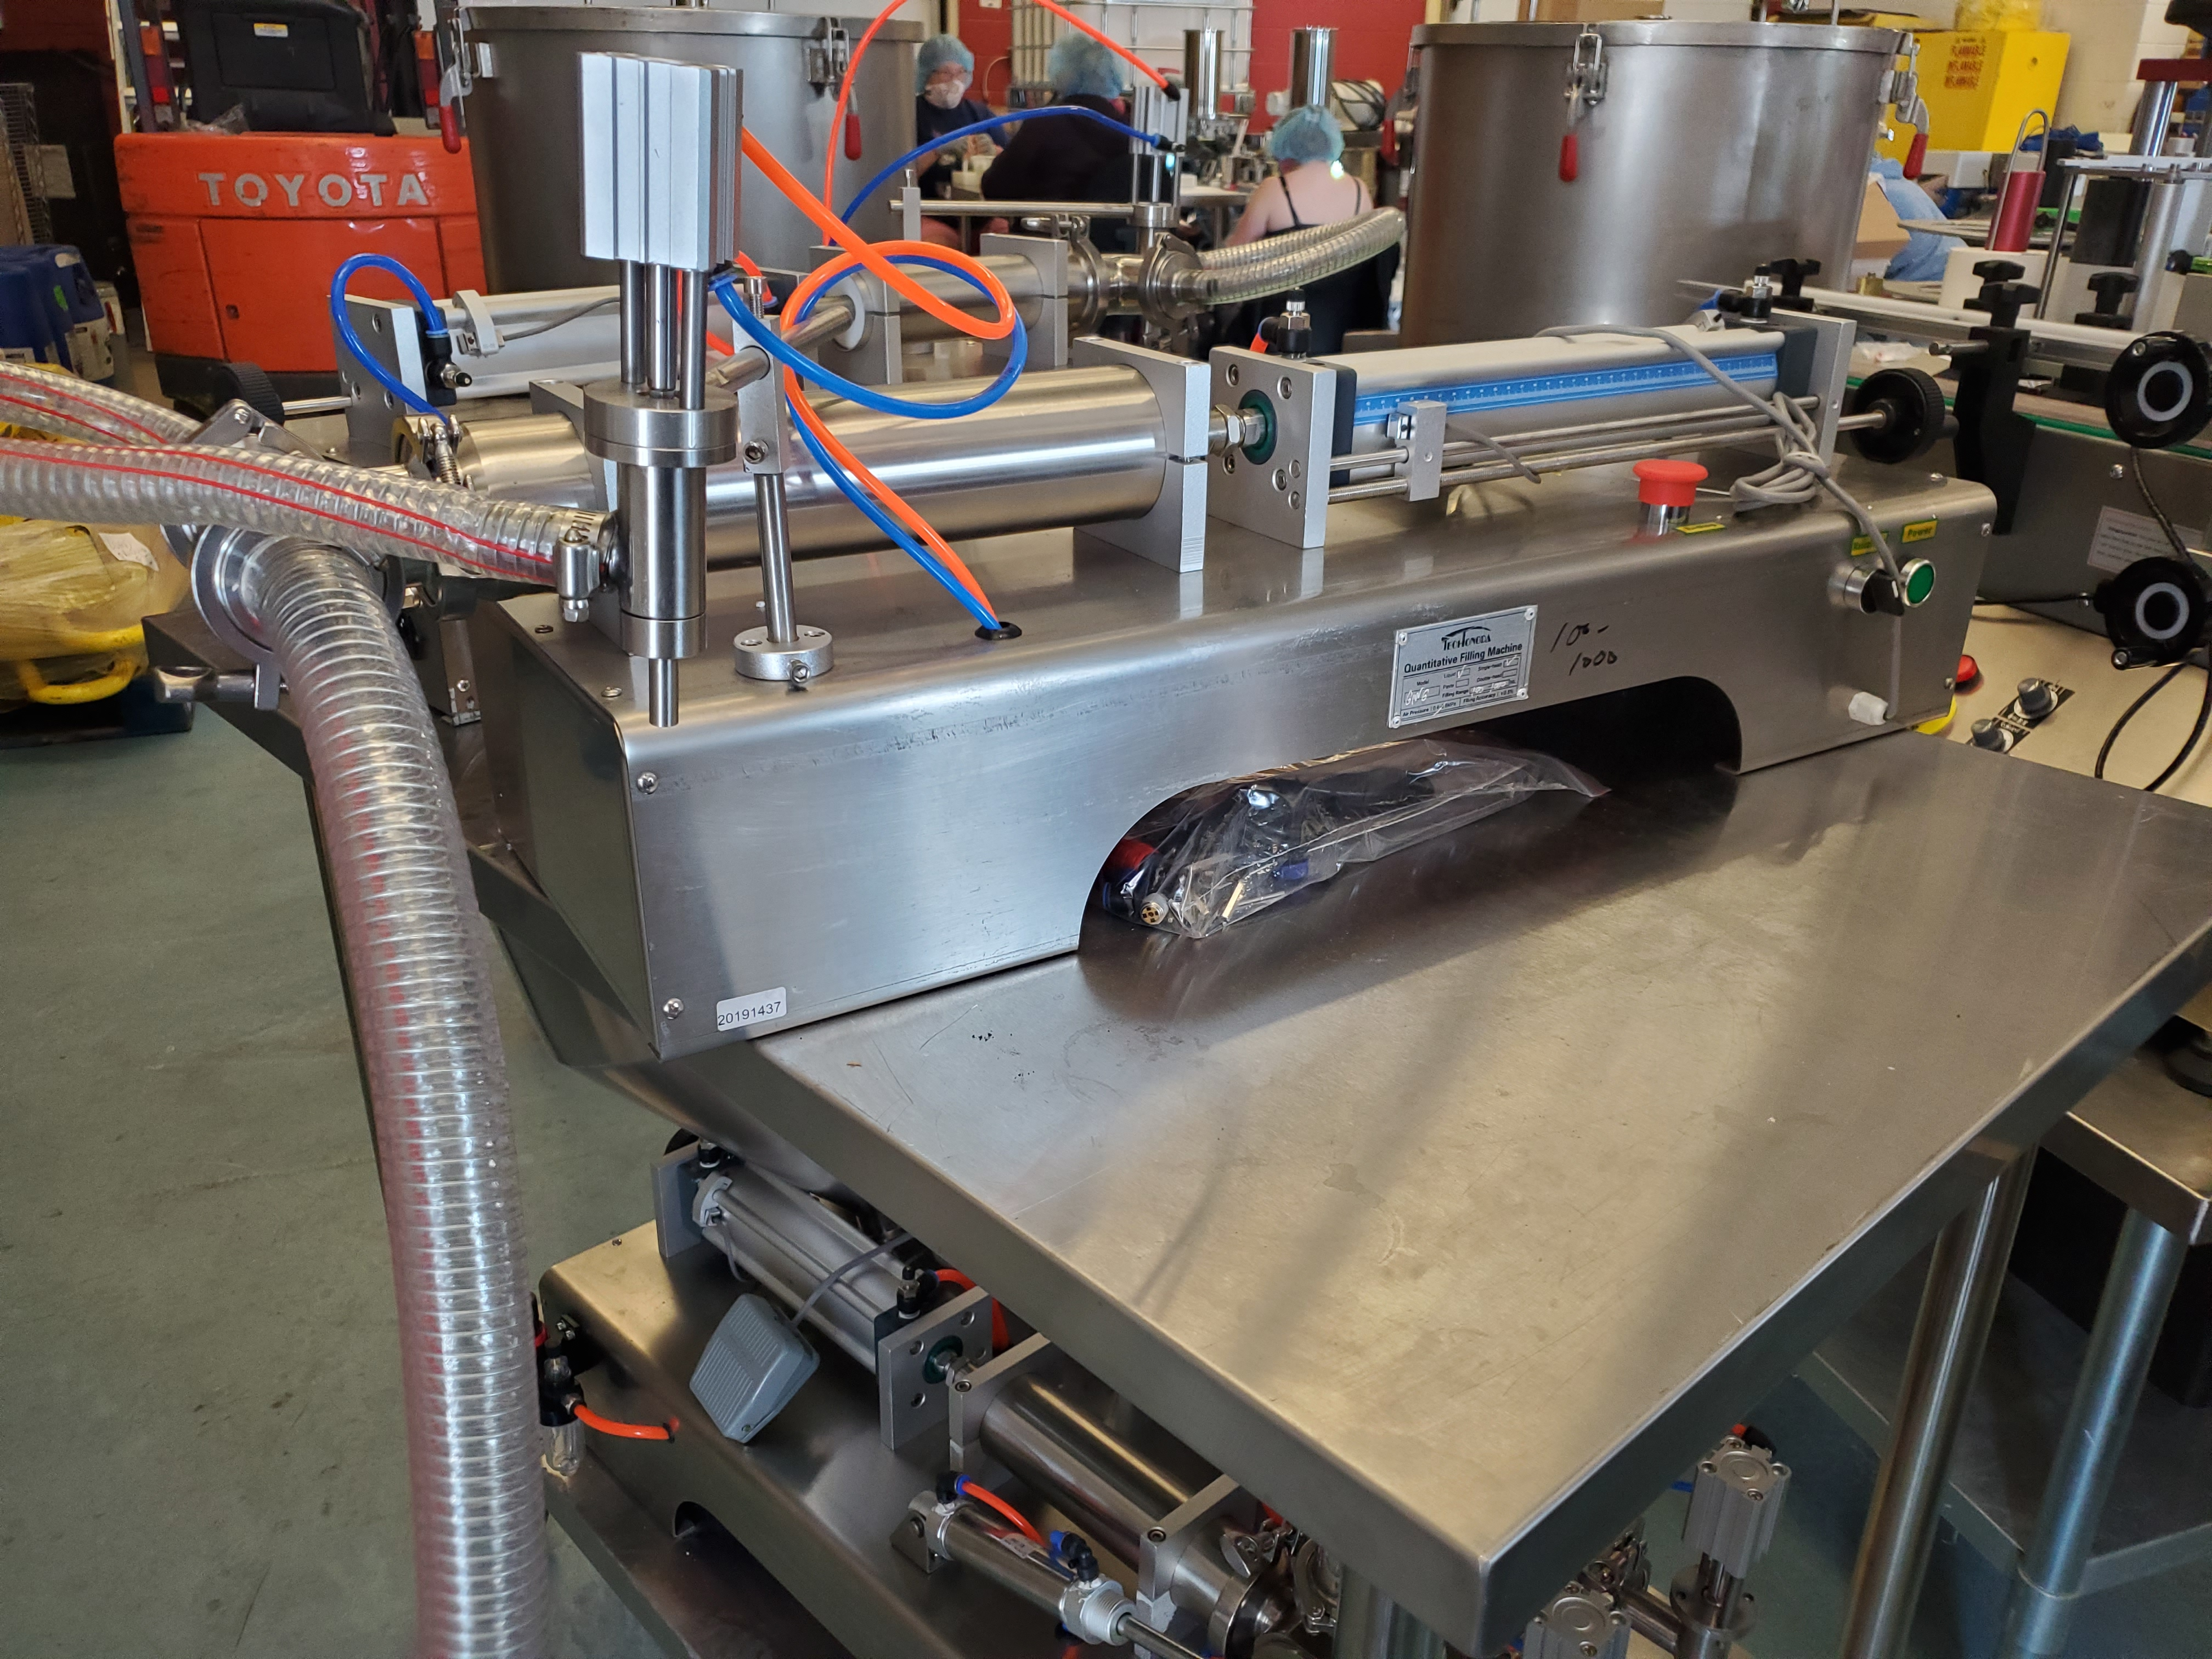 Stainless Steel Horizontal Piston Filler - Table Top Model - Image 2 of 3